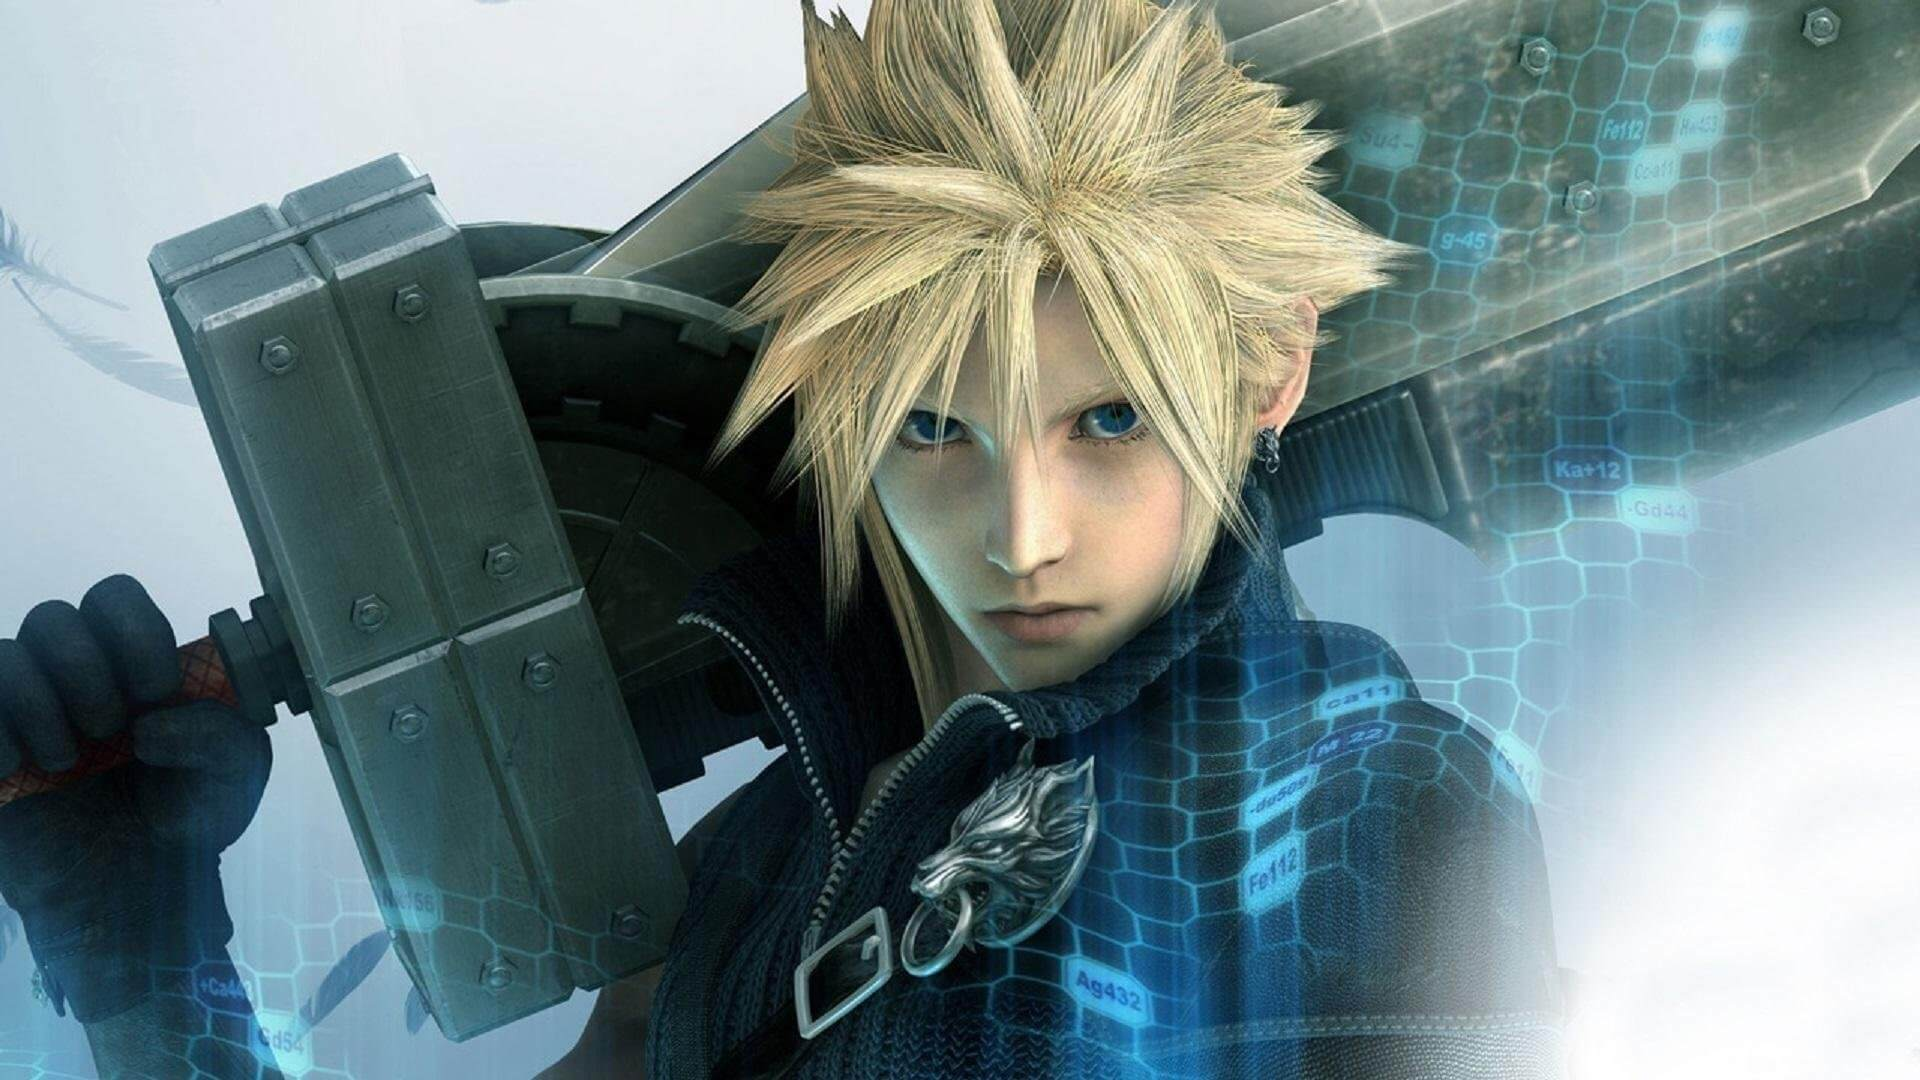 Final Fantasy VII Remake Brings Back Voice Actor for Cloud Strife